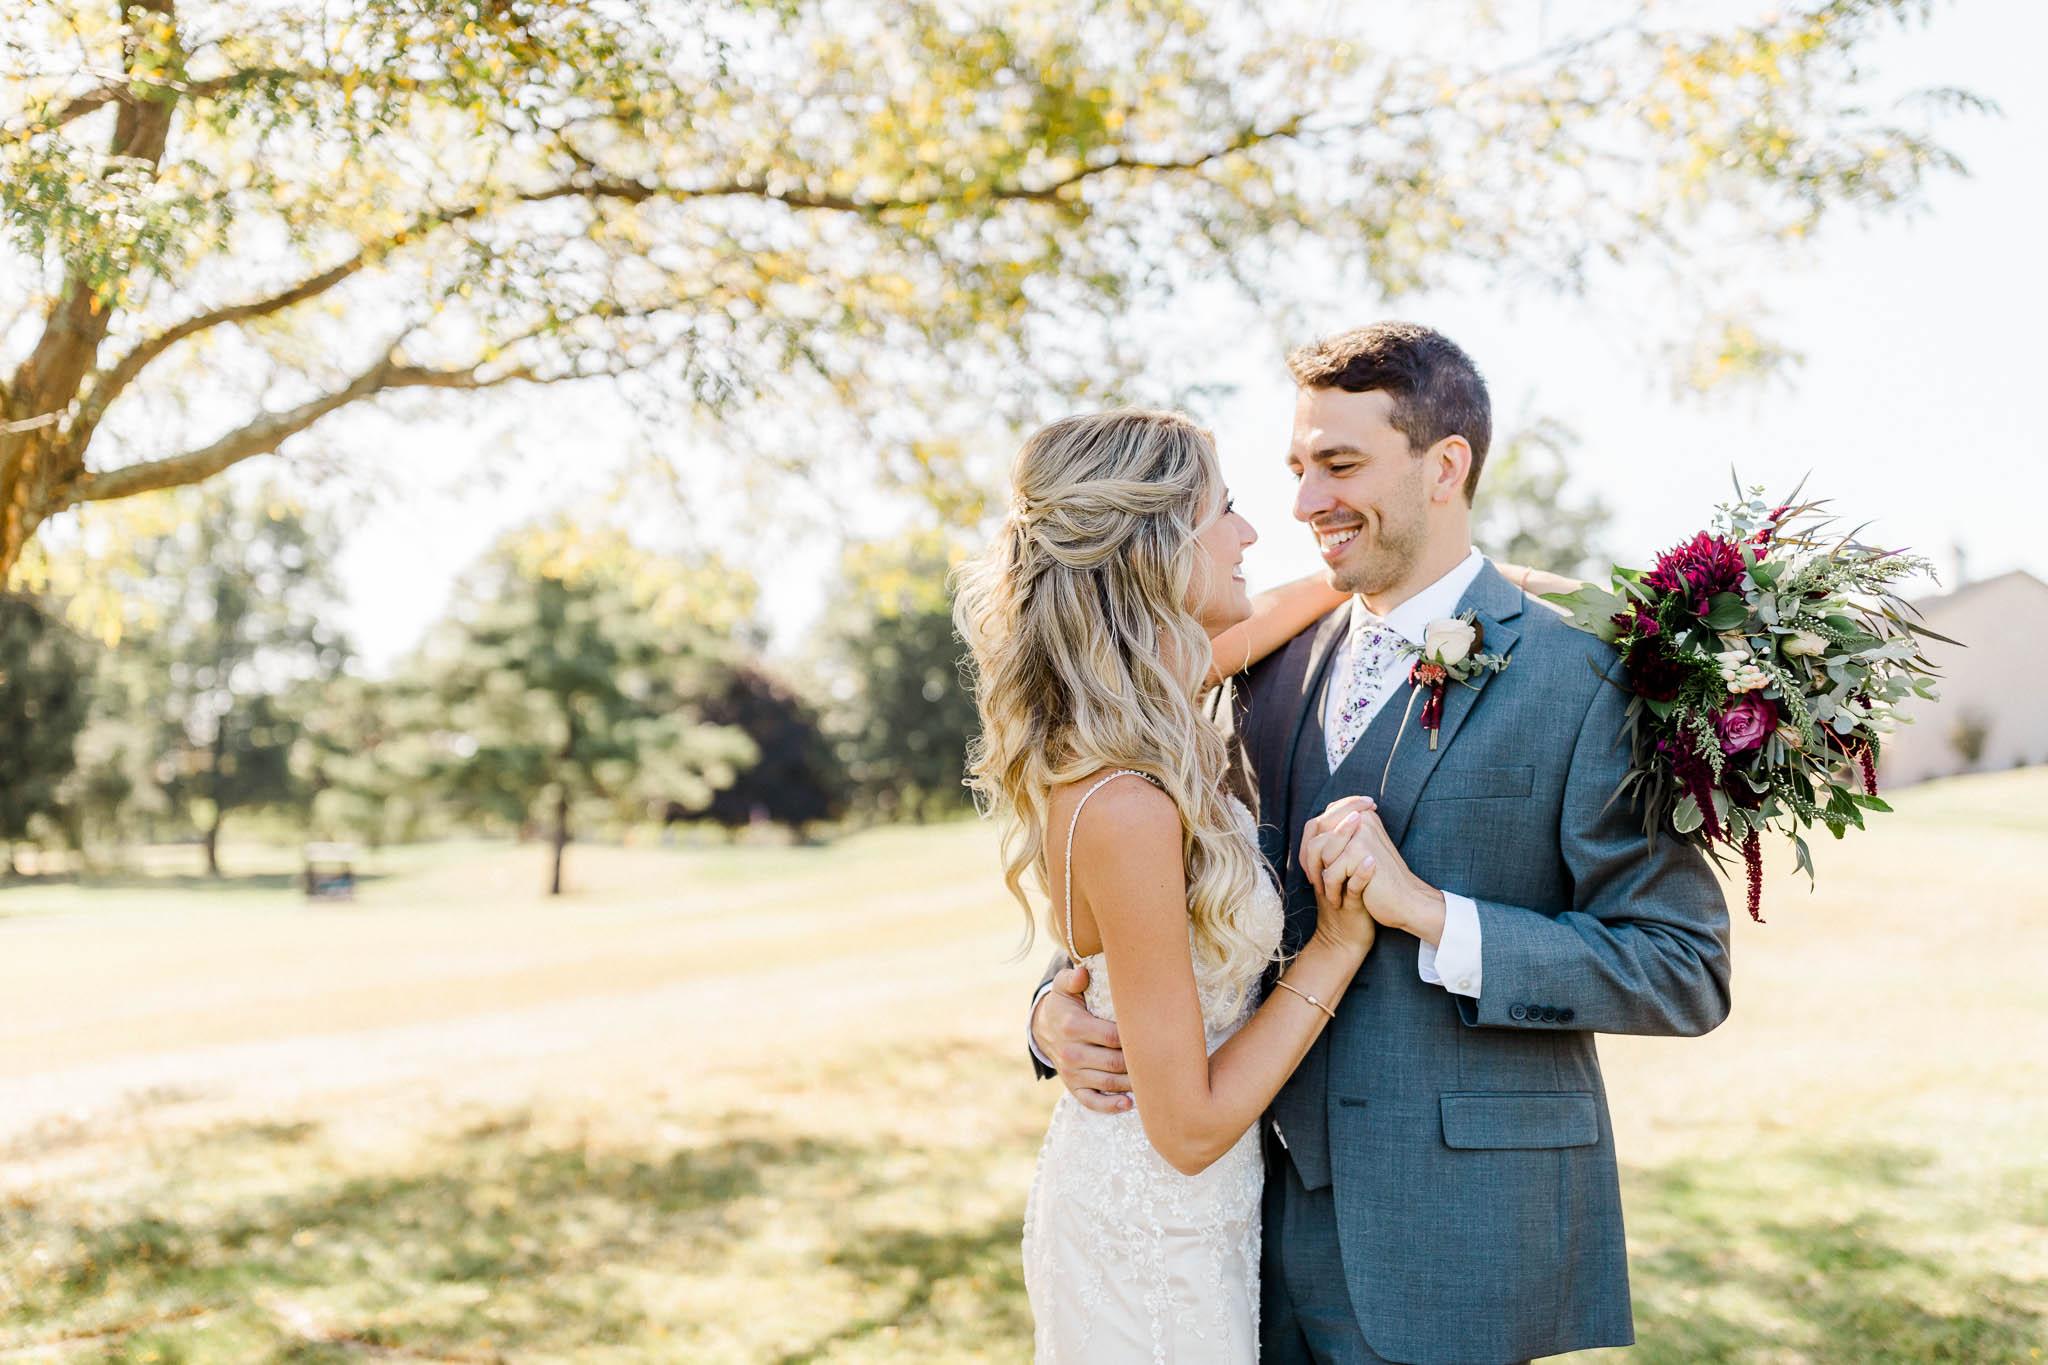 Frosty-Valley-September-Wedding-7624.jpg